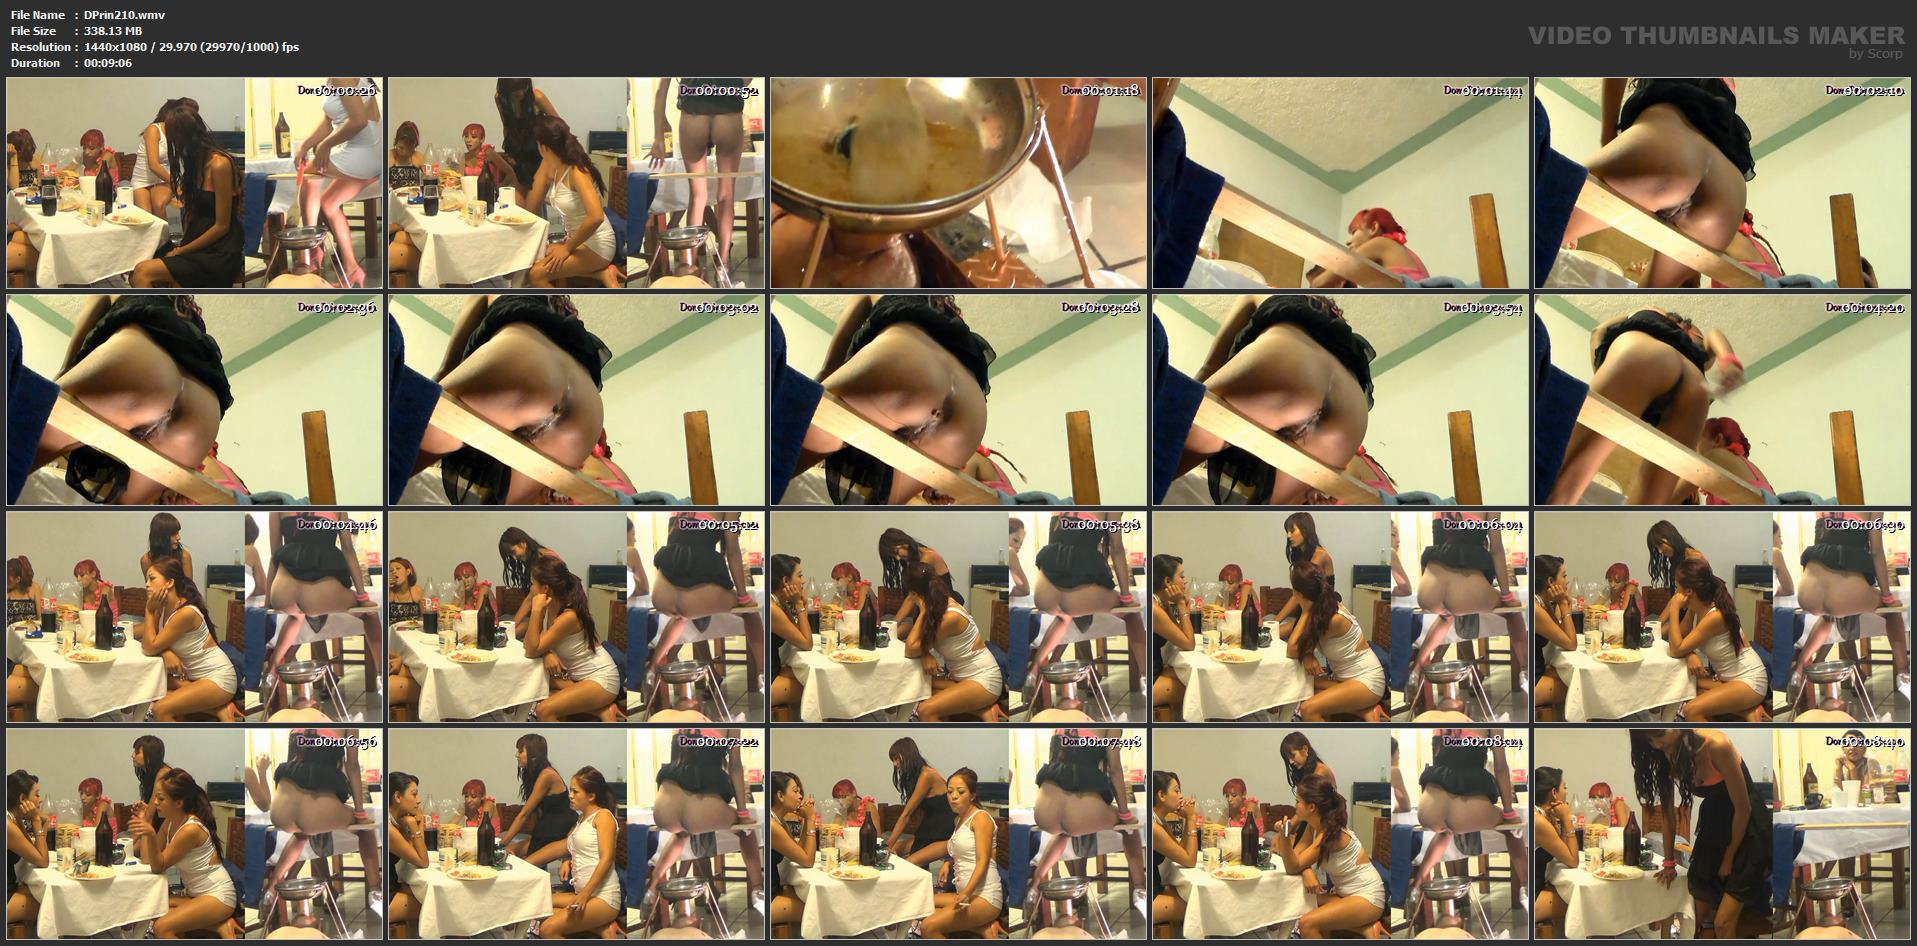 [DOM-PRINCESS] Toilet Mouth High Pressure System Part 4 Carmen [FULL HD][1080p][WMV]